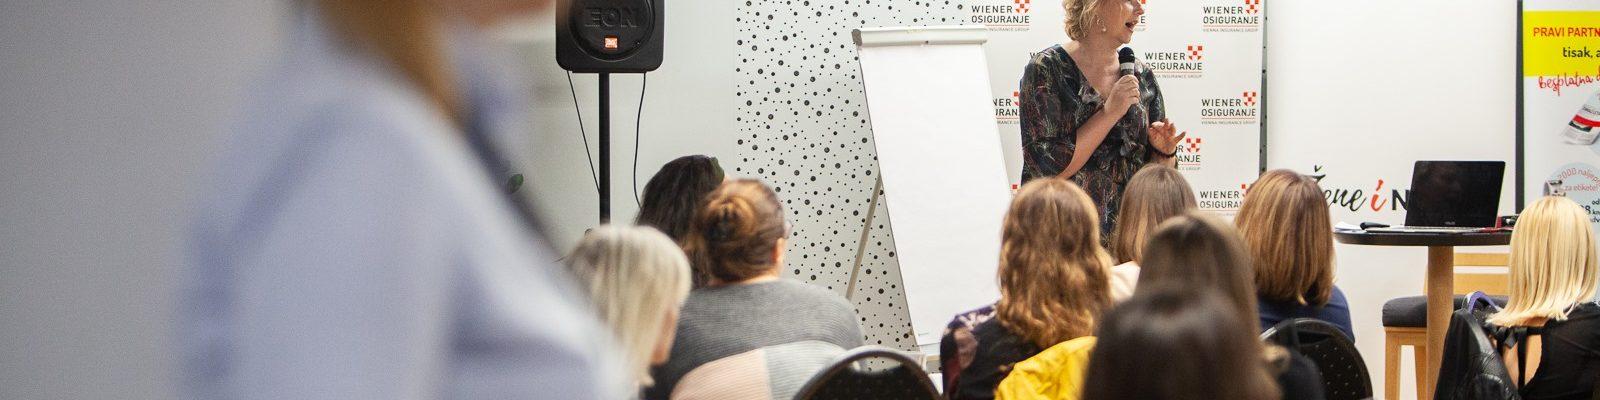 "Održana prva konferencija ""Žene i novac"" s porukom: Sloboda žena počinje ekonomskom slobodom"